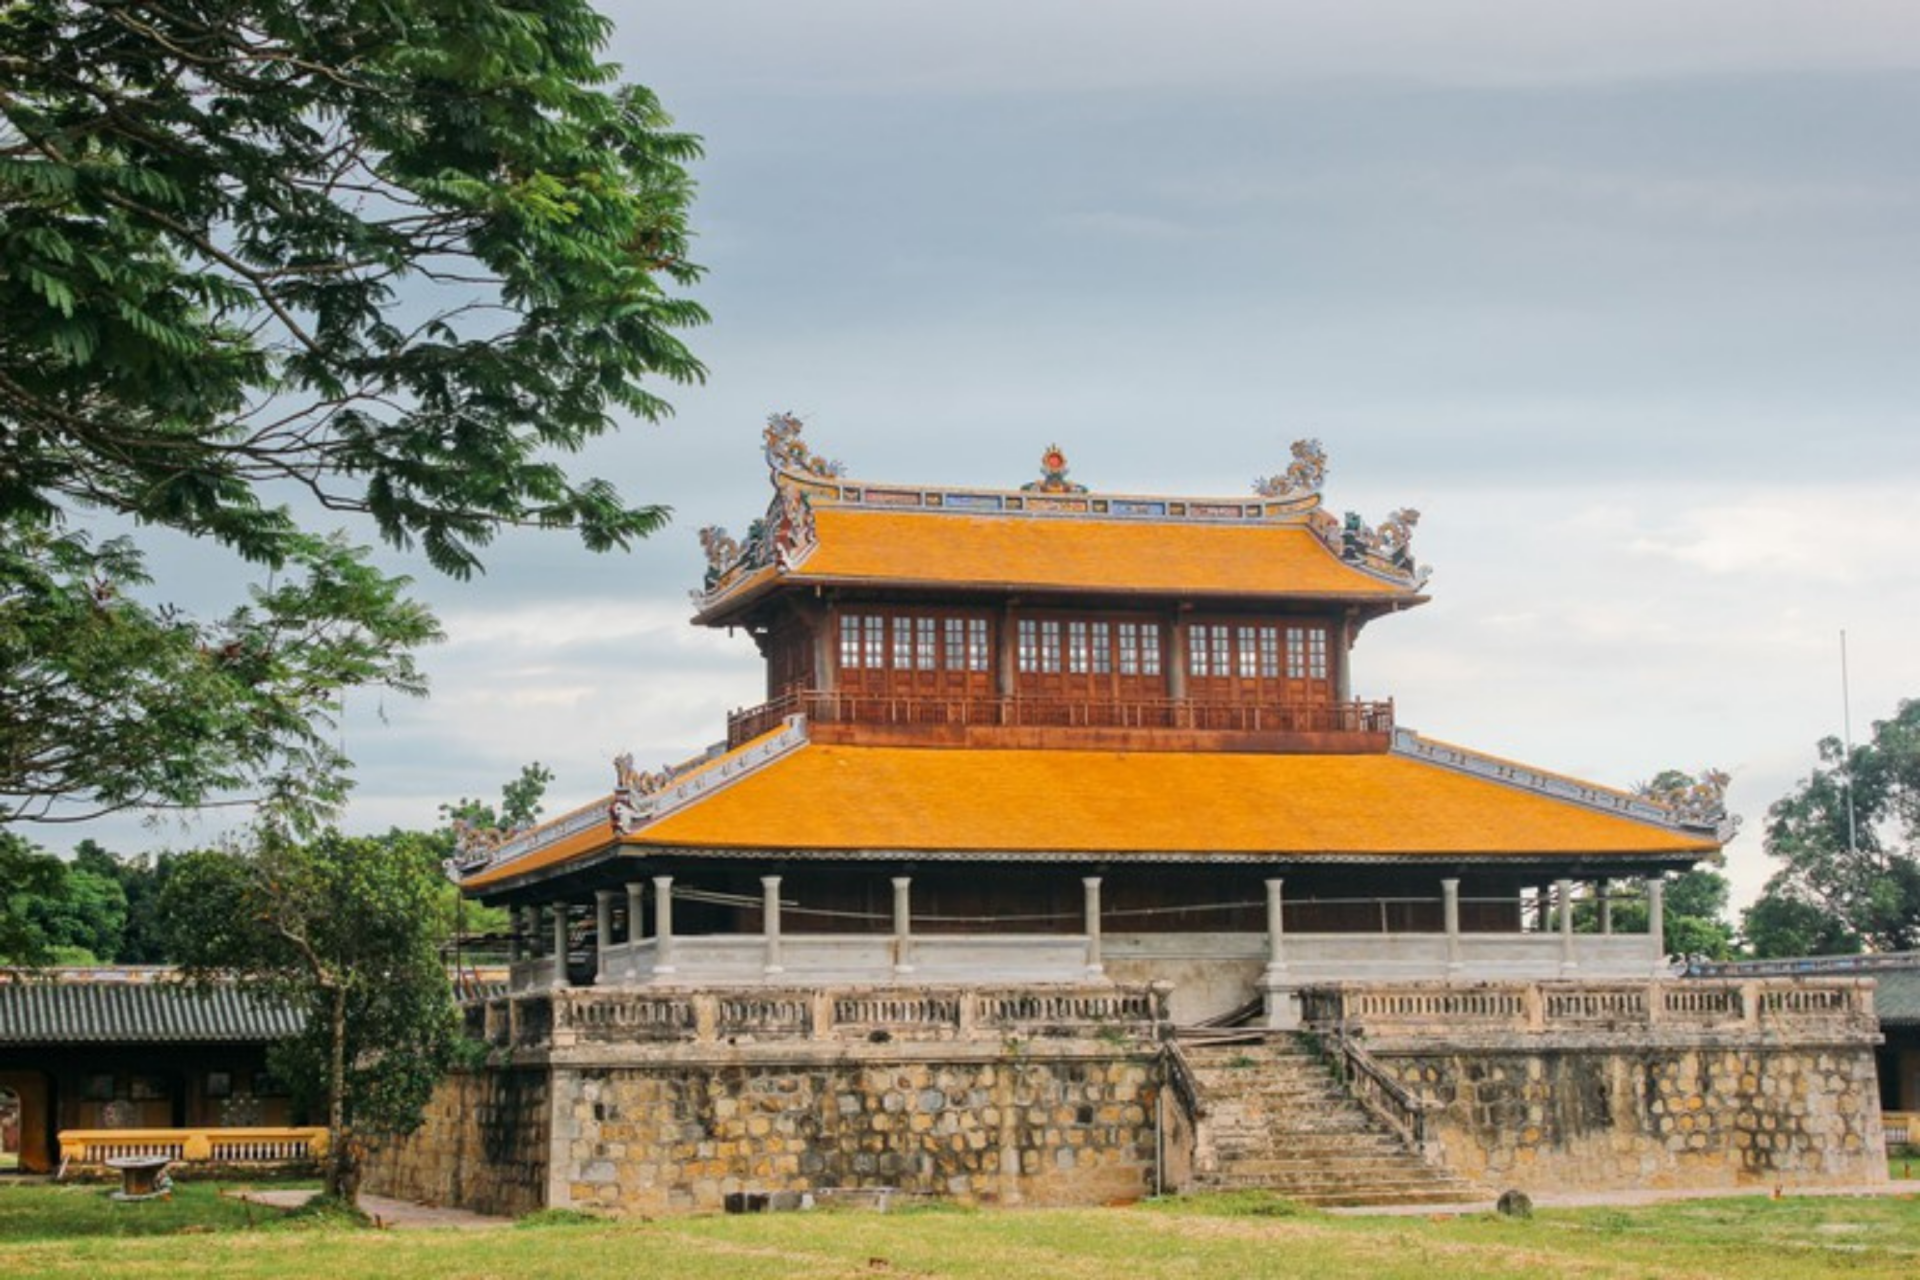 The antique beatuty of Hue Citadel